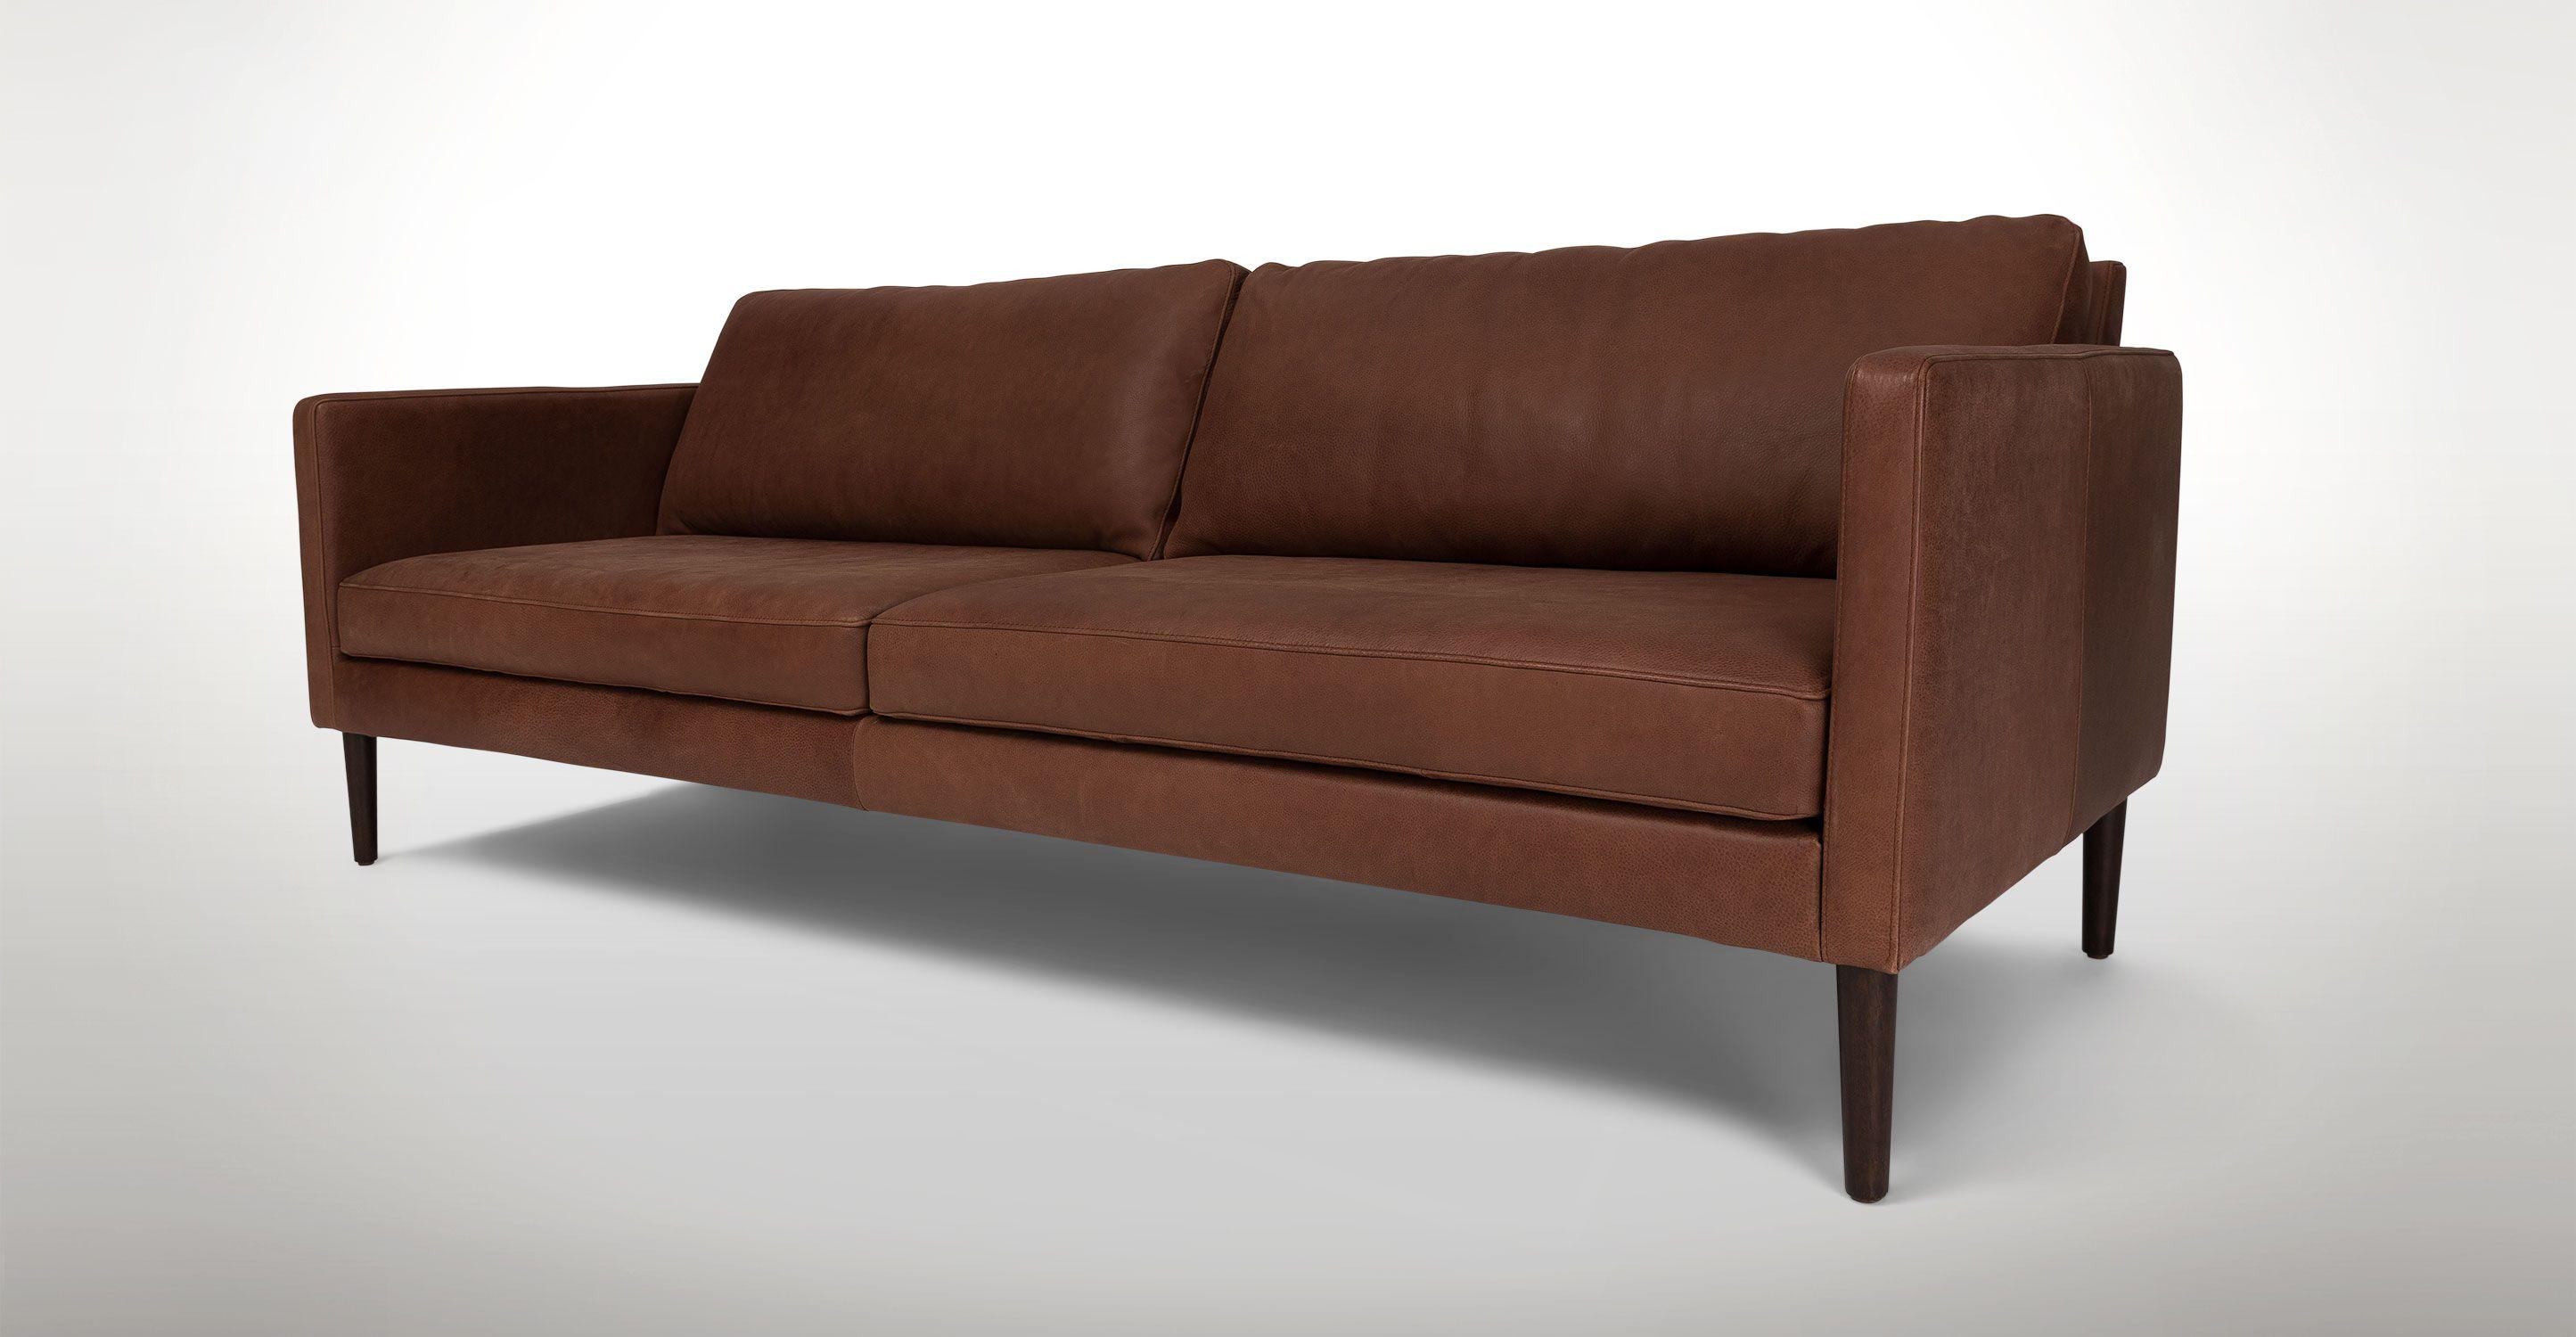 Echo Primo Sedona Brown Sofa | decor | Gray sofa, Sofa, Leather sofa